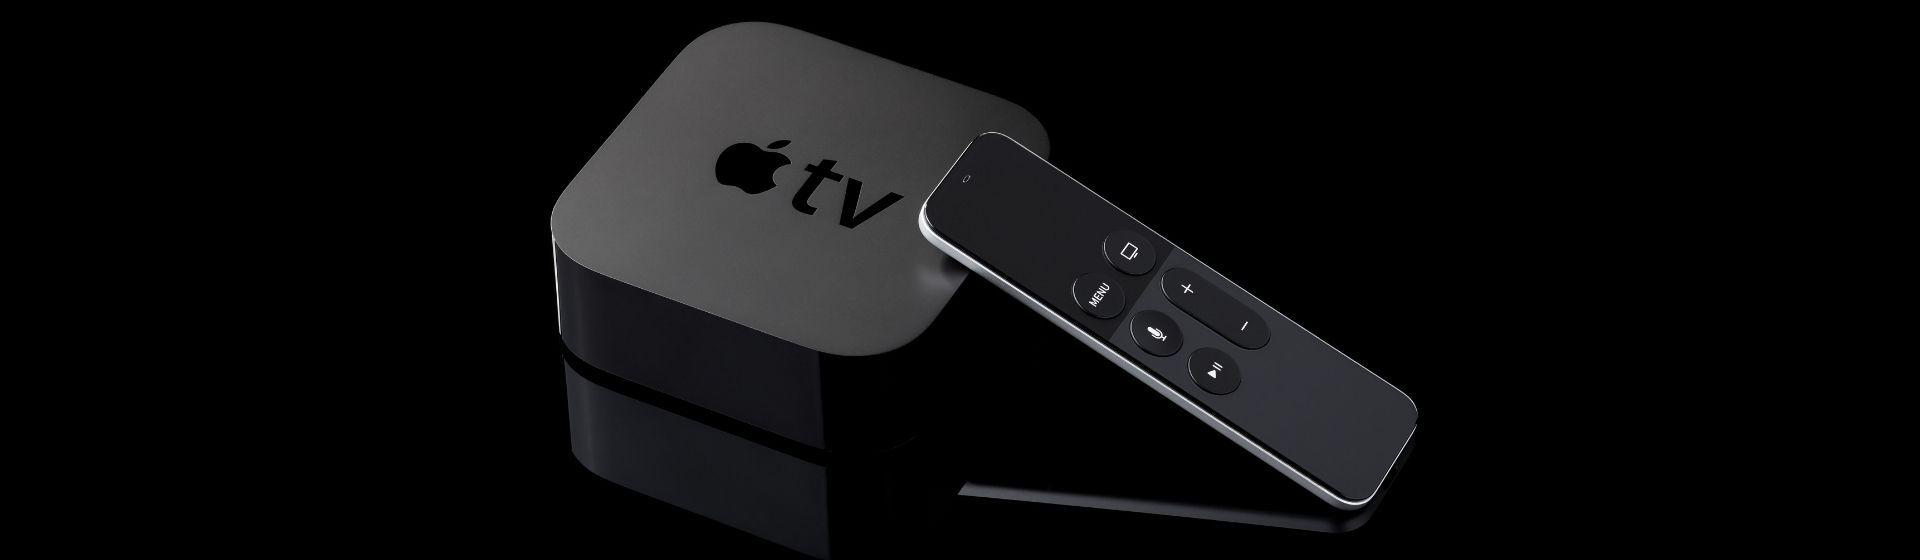 Como funciona Apple TV 4K?